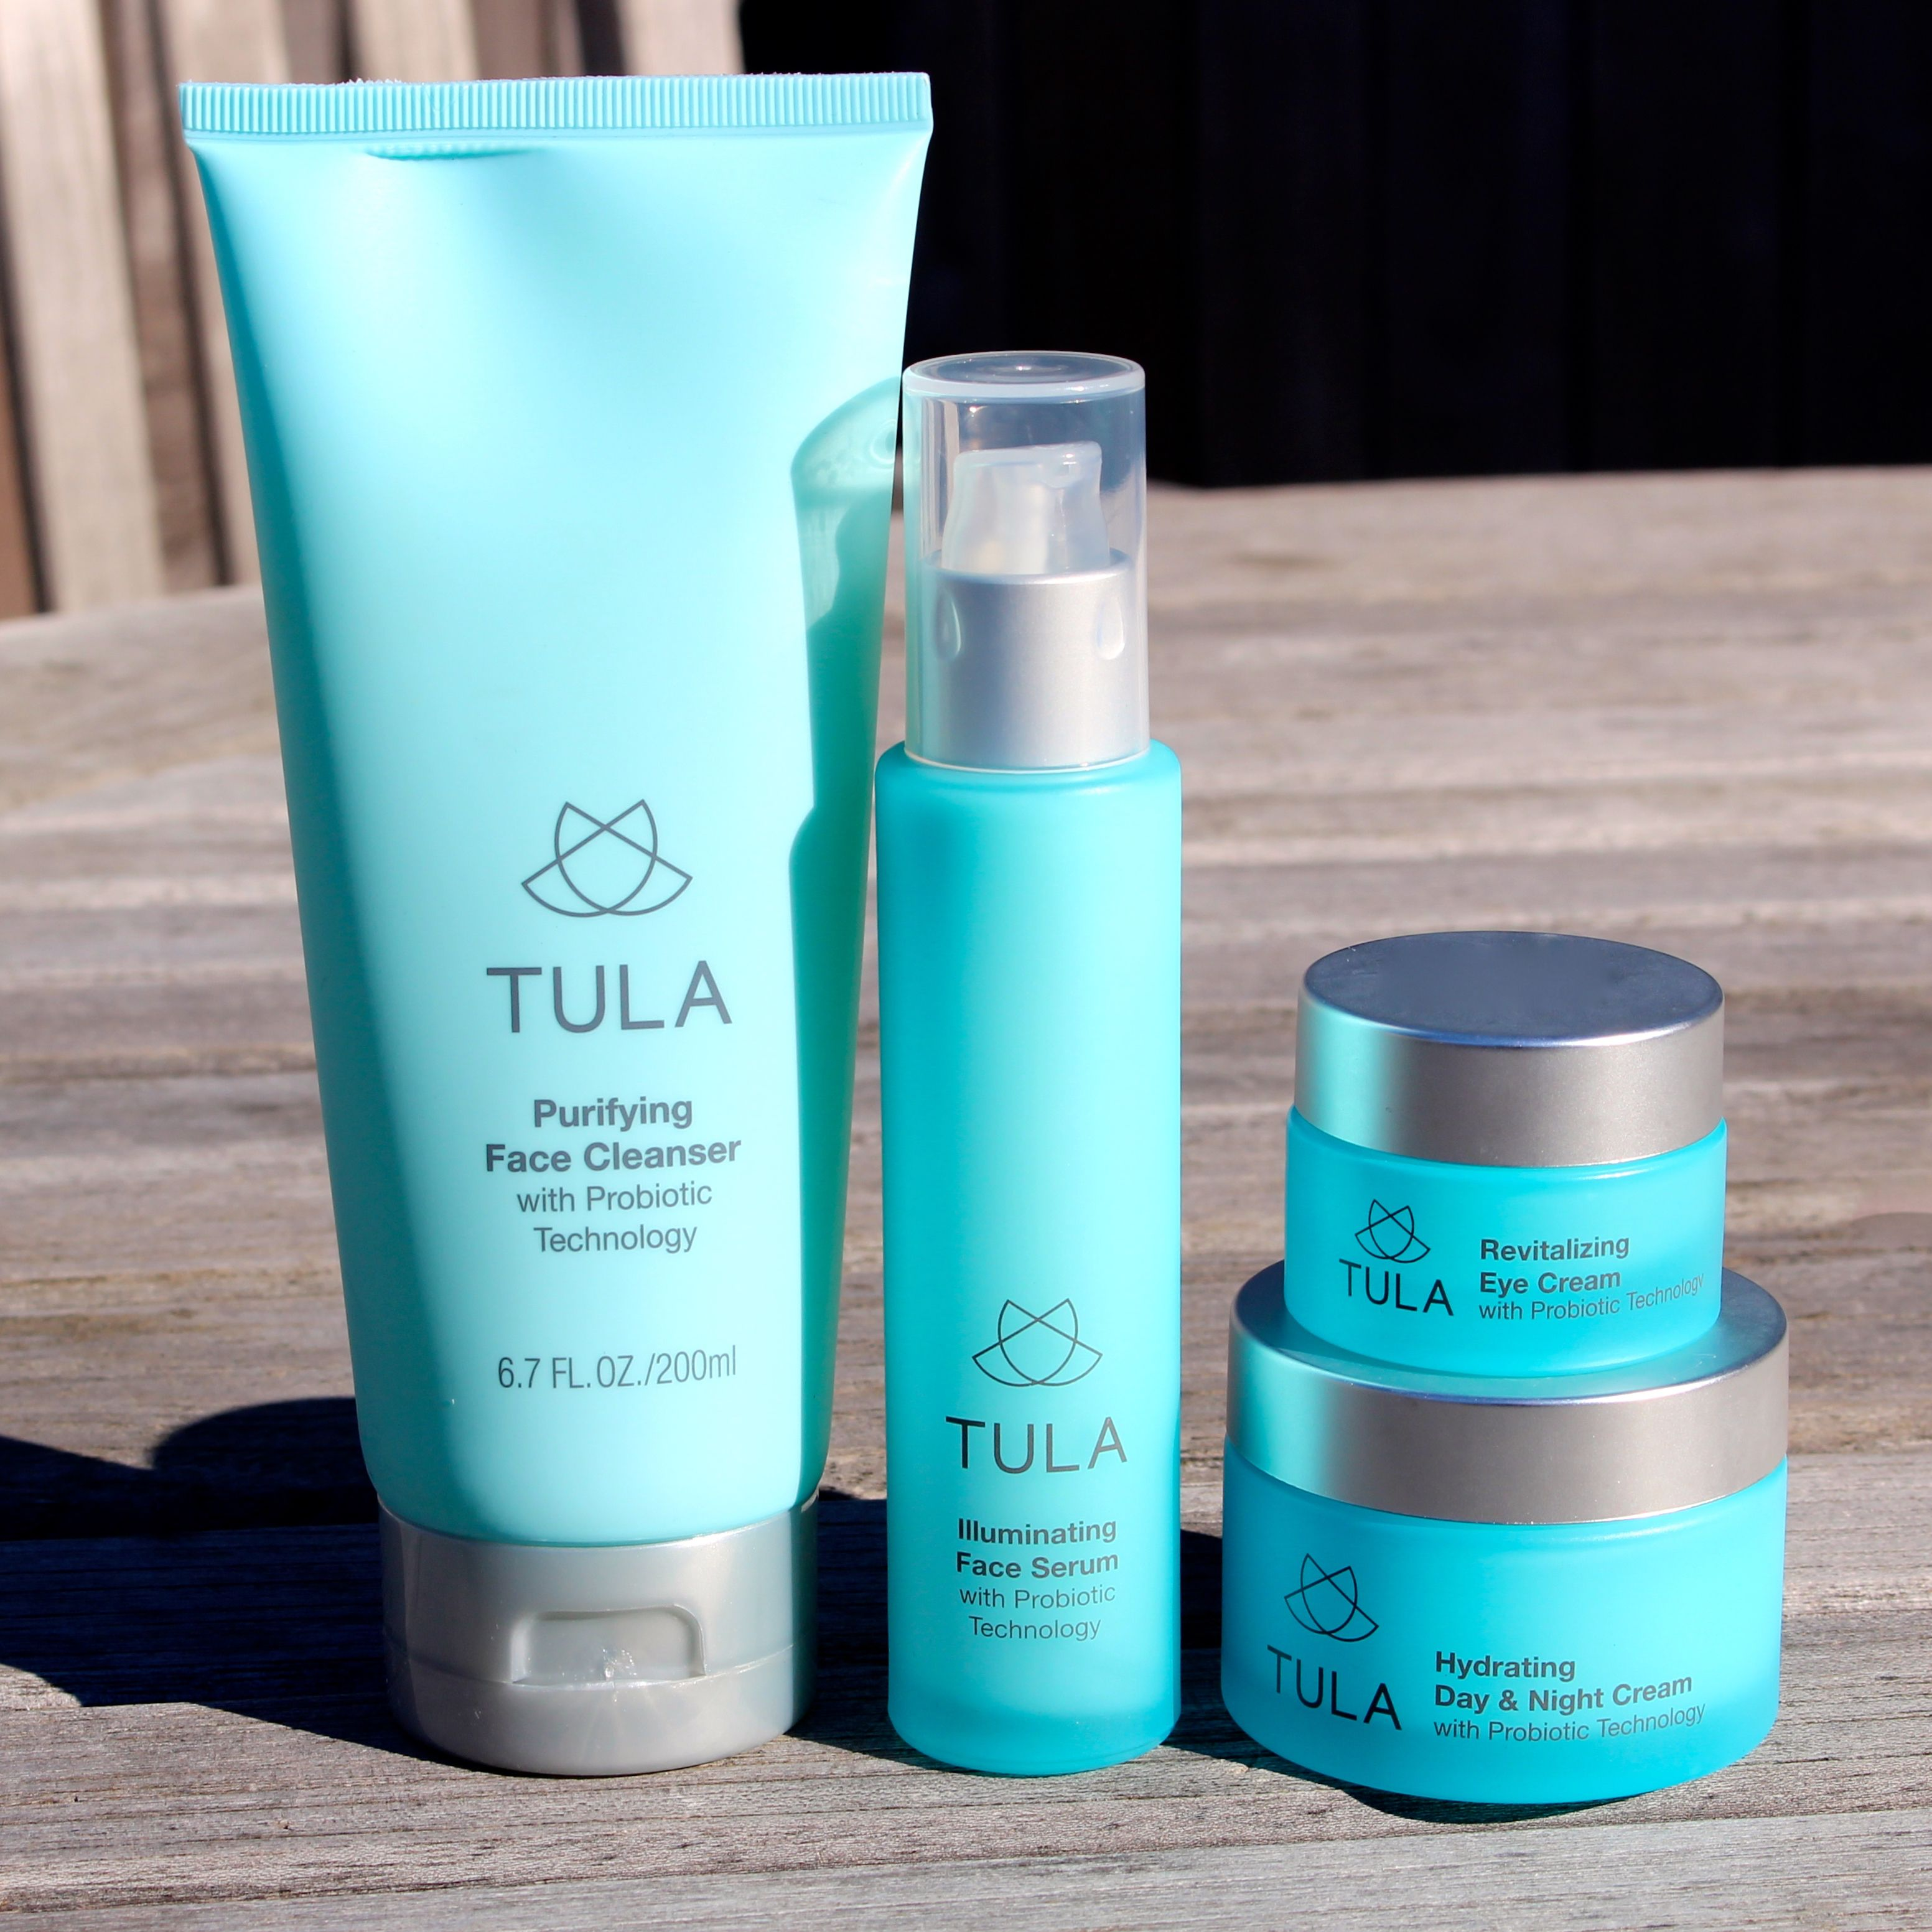 24-7 Moisture Hydrating Day & Night Cream by Tula #20